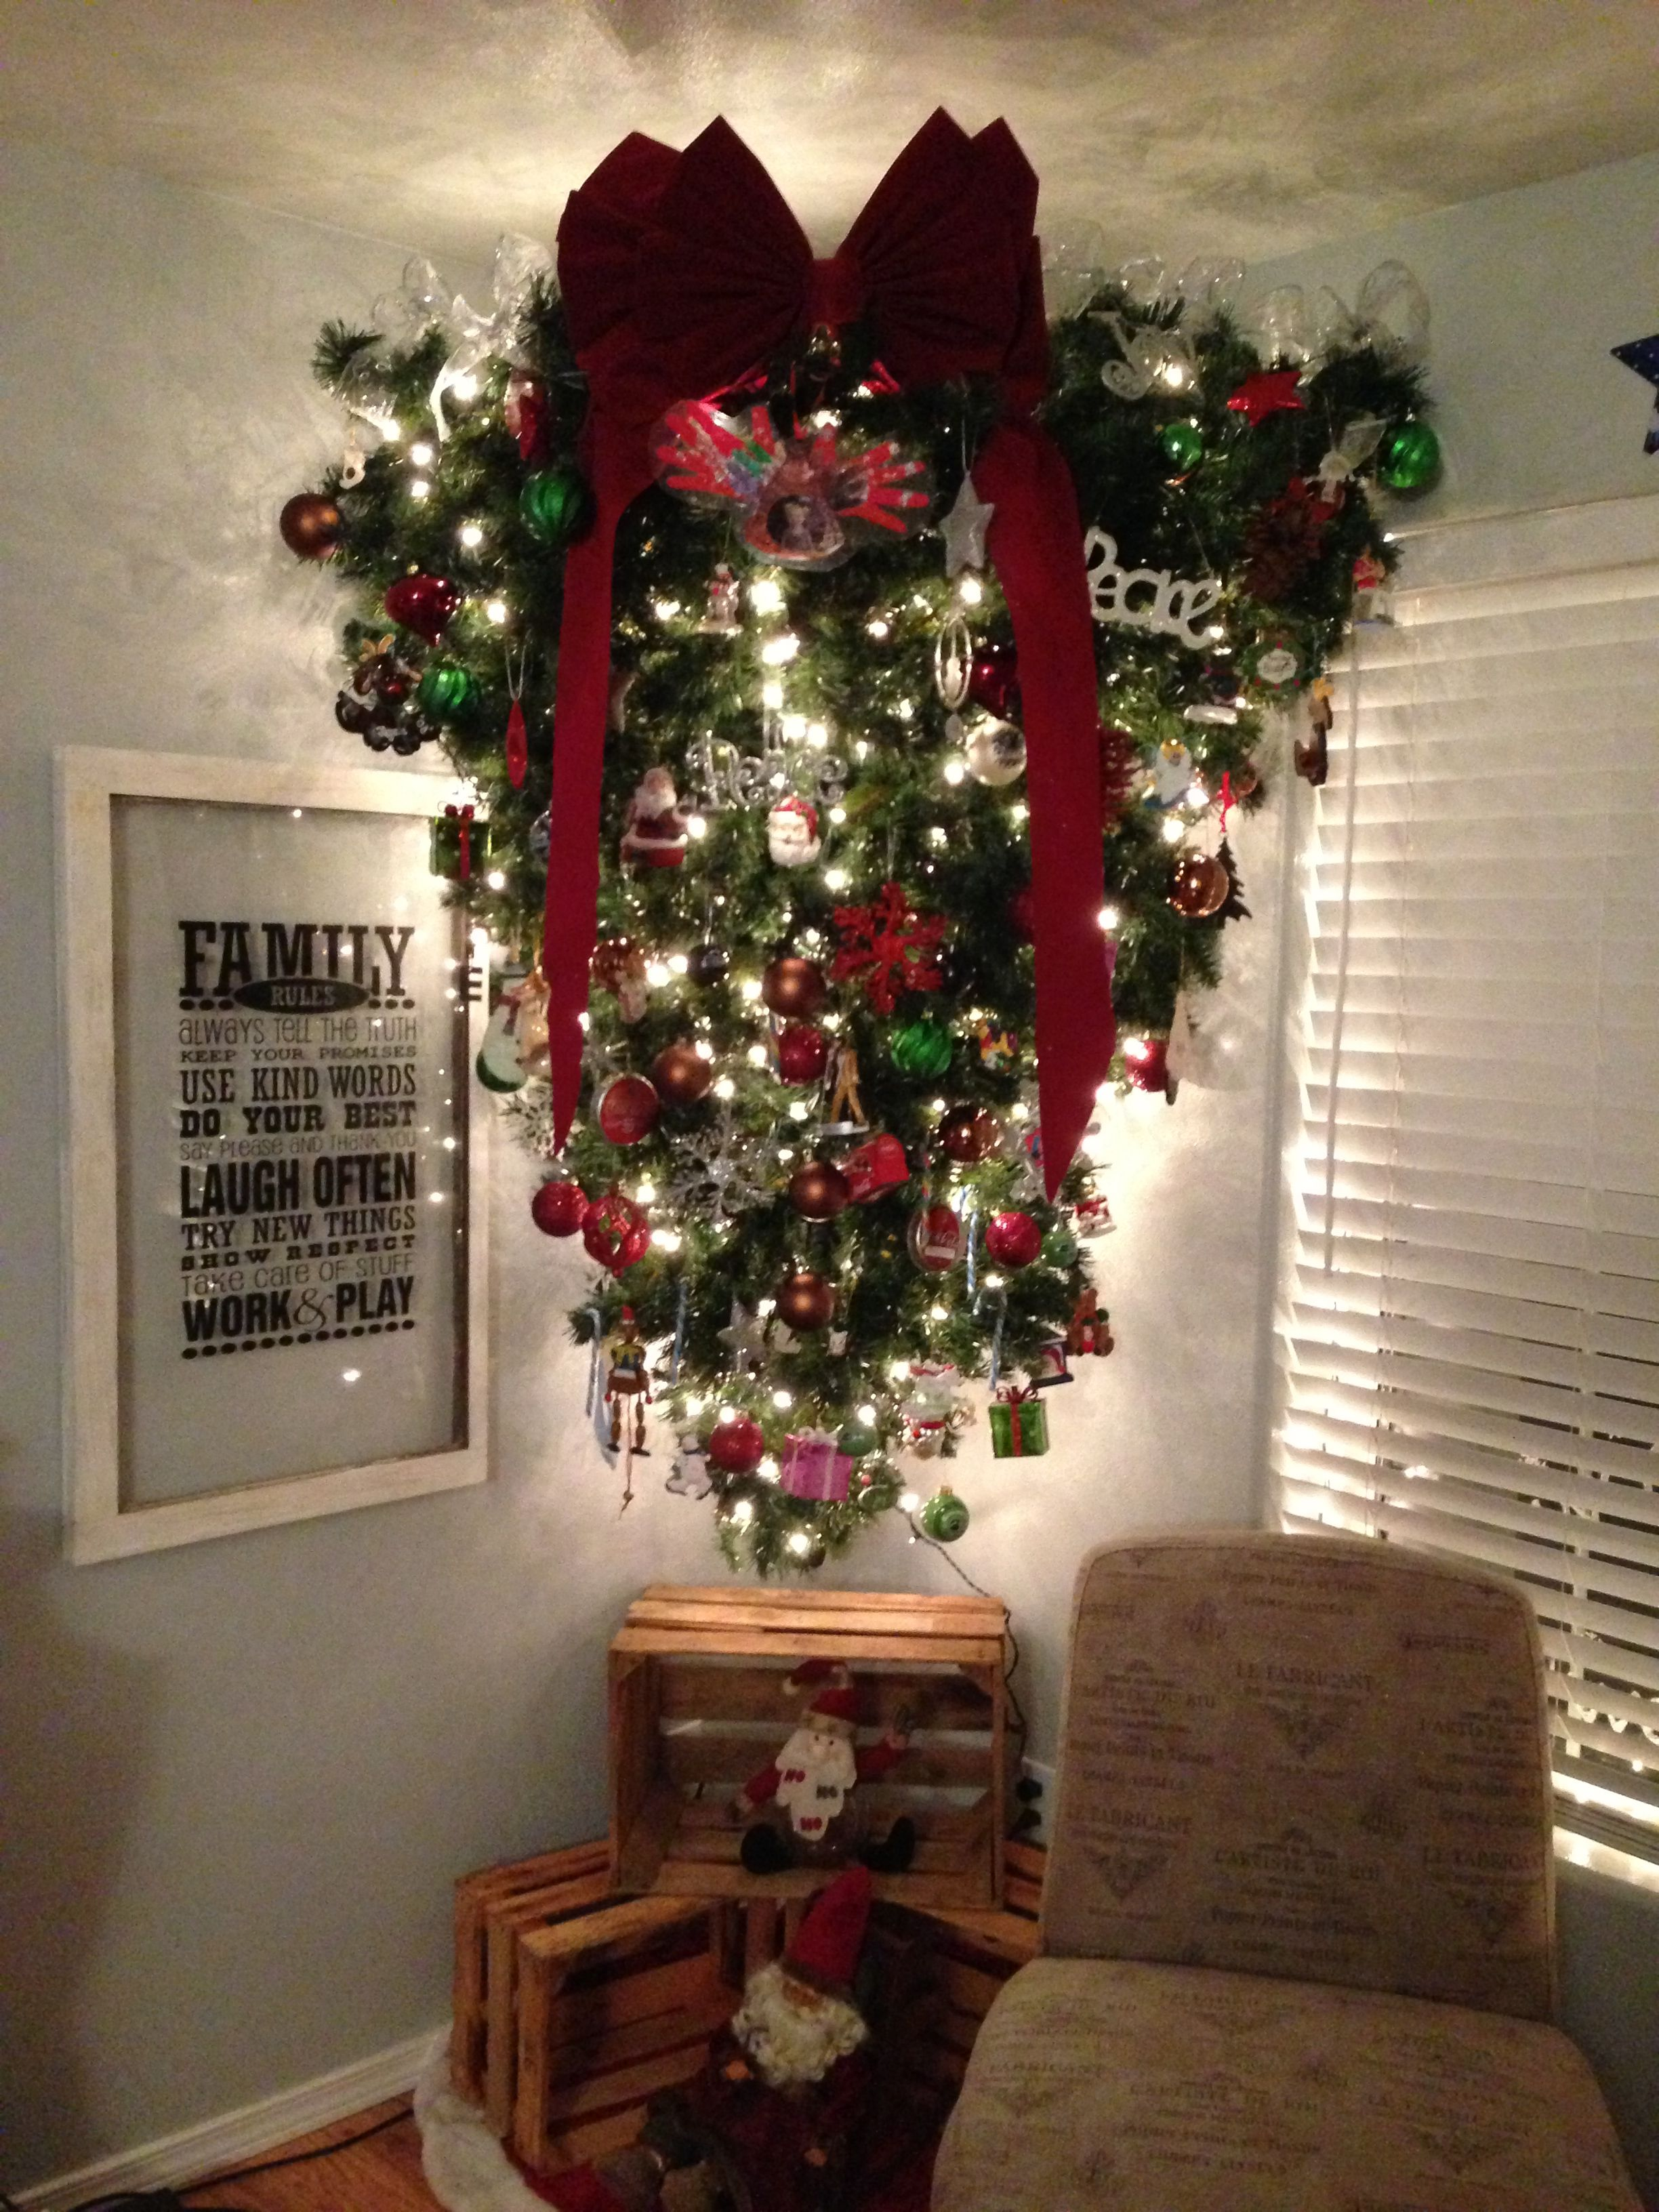 My Upside Down Christmas Tree My Favorite Way To Do Our Christmas Tree Now Upside Down Christmas Tree Hanging Christmas Tree Small Christmas Trees